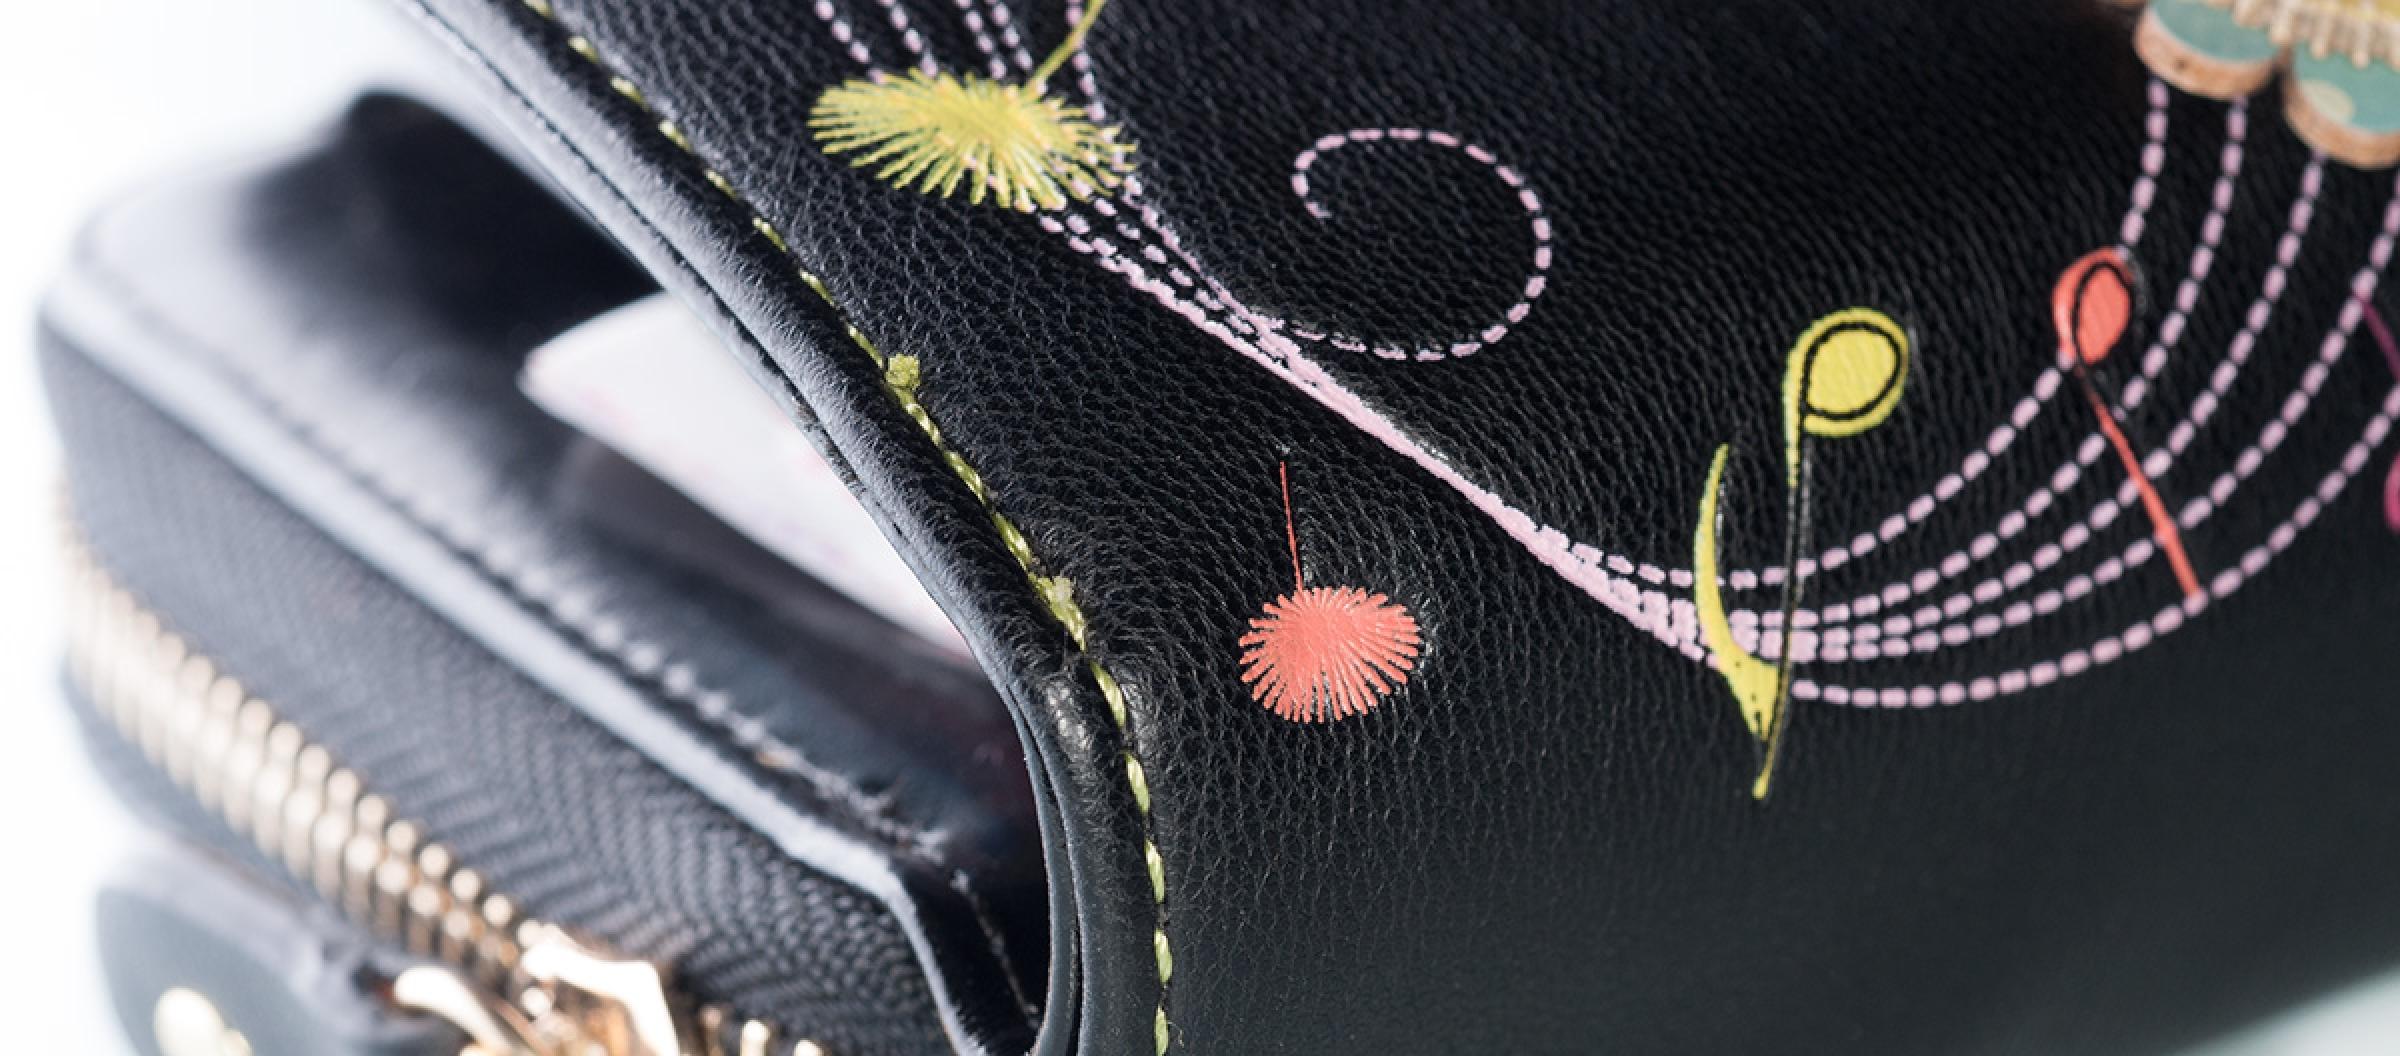 Fashion leather goods